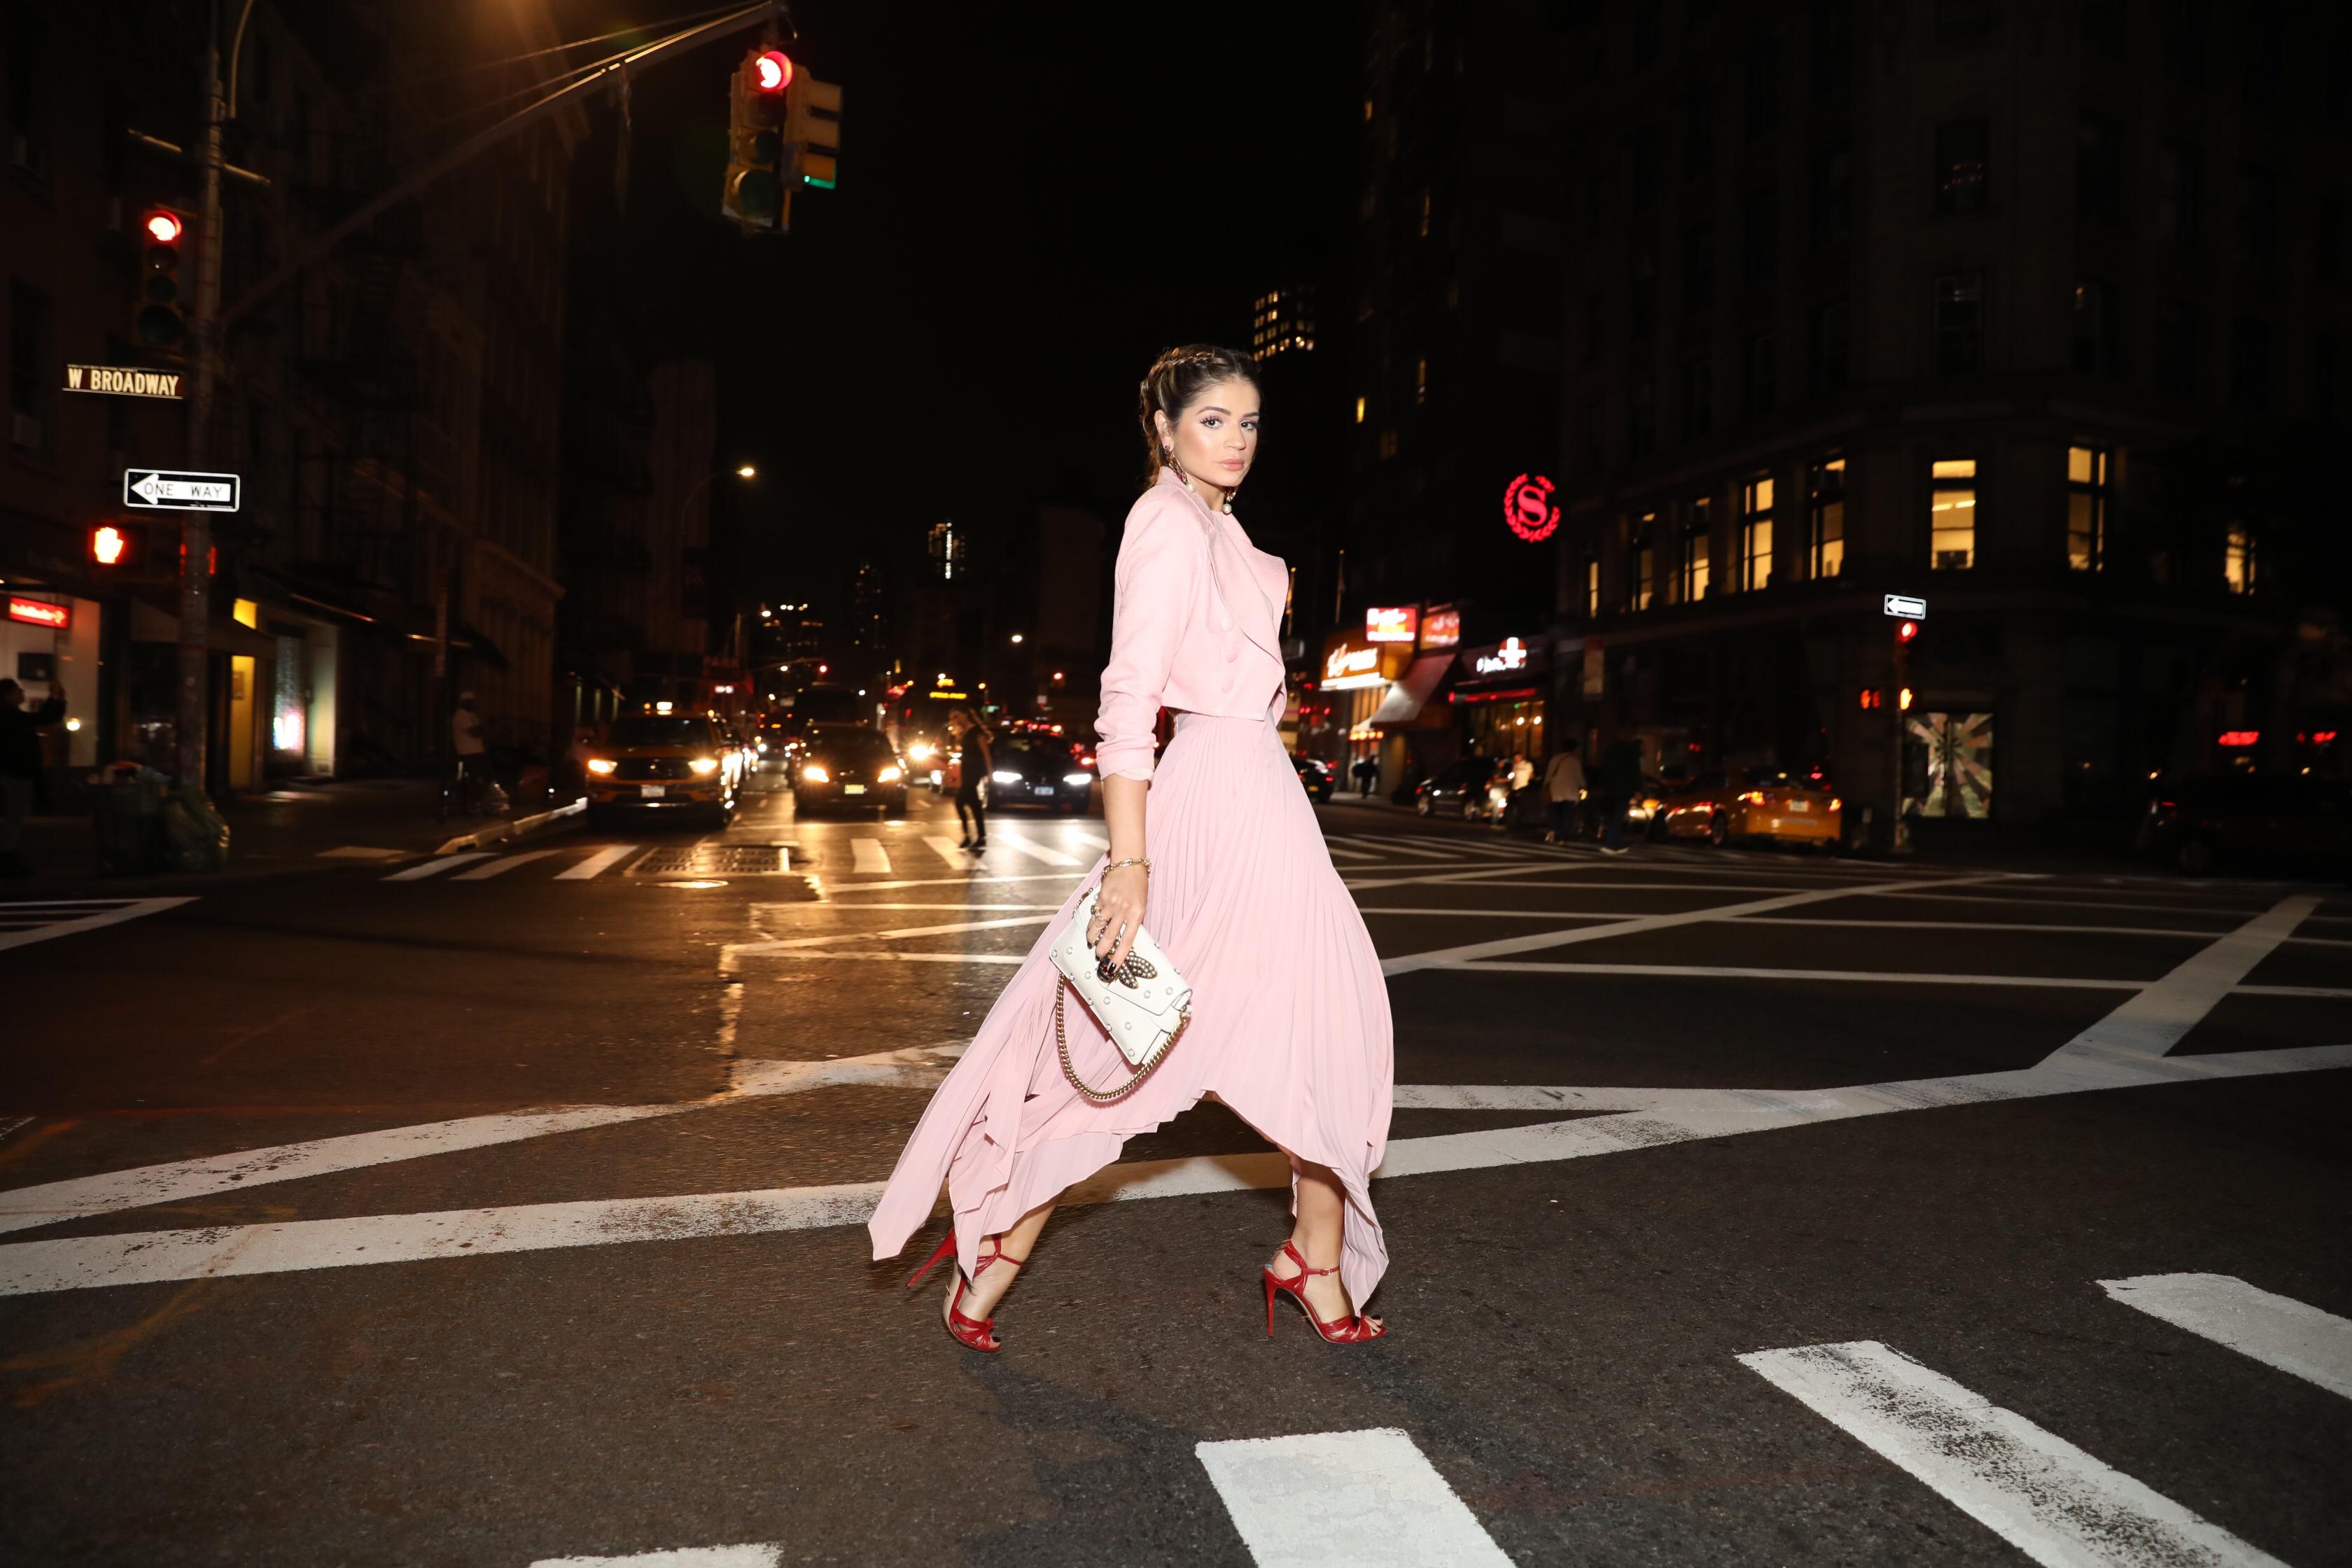 Thassia de rosa iorane NY 5